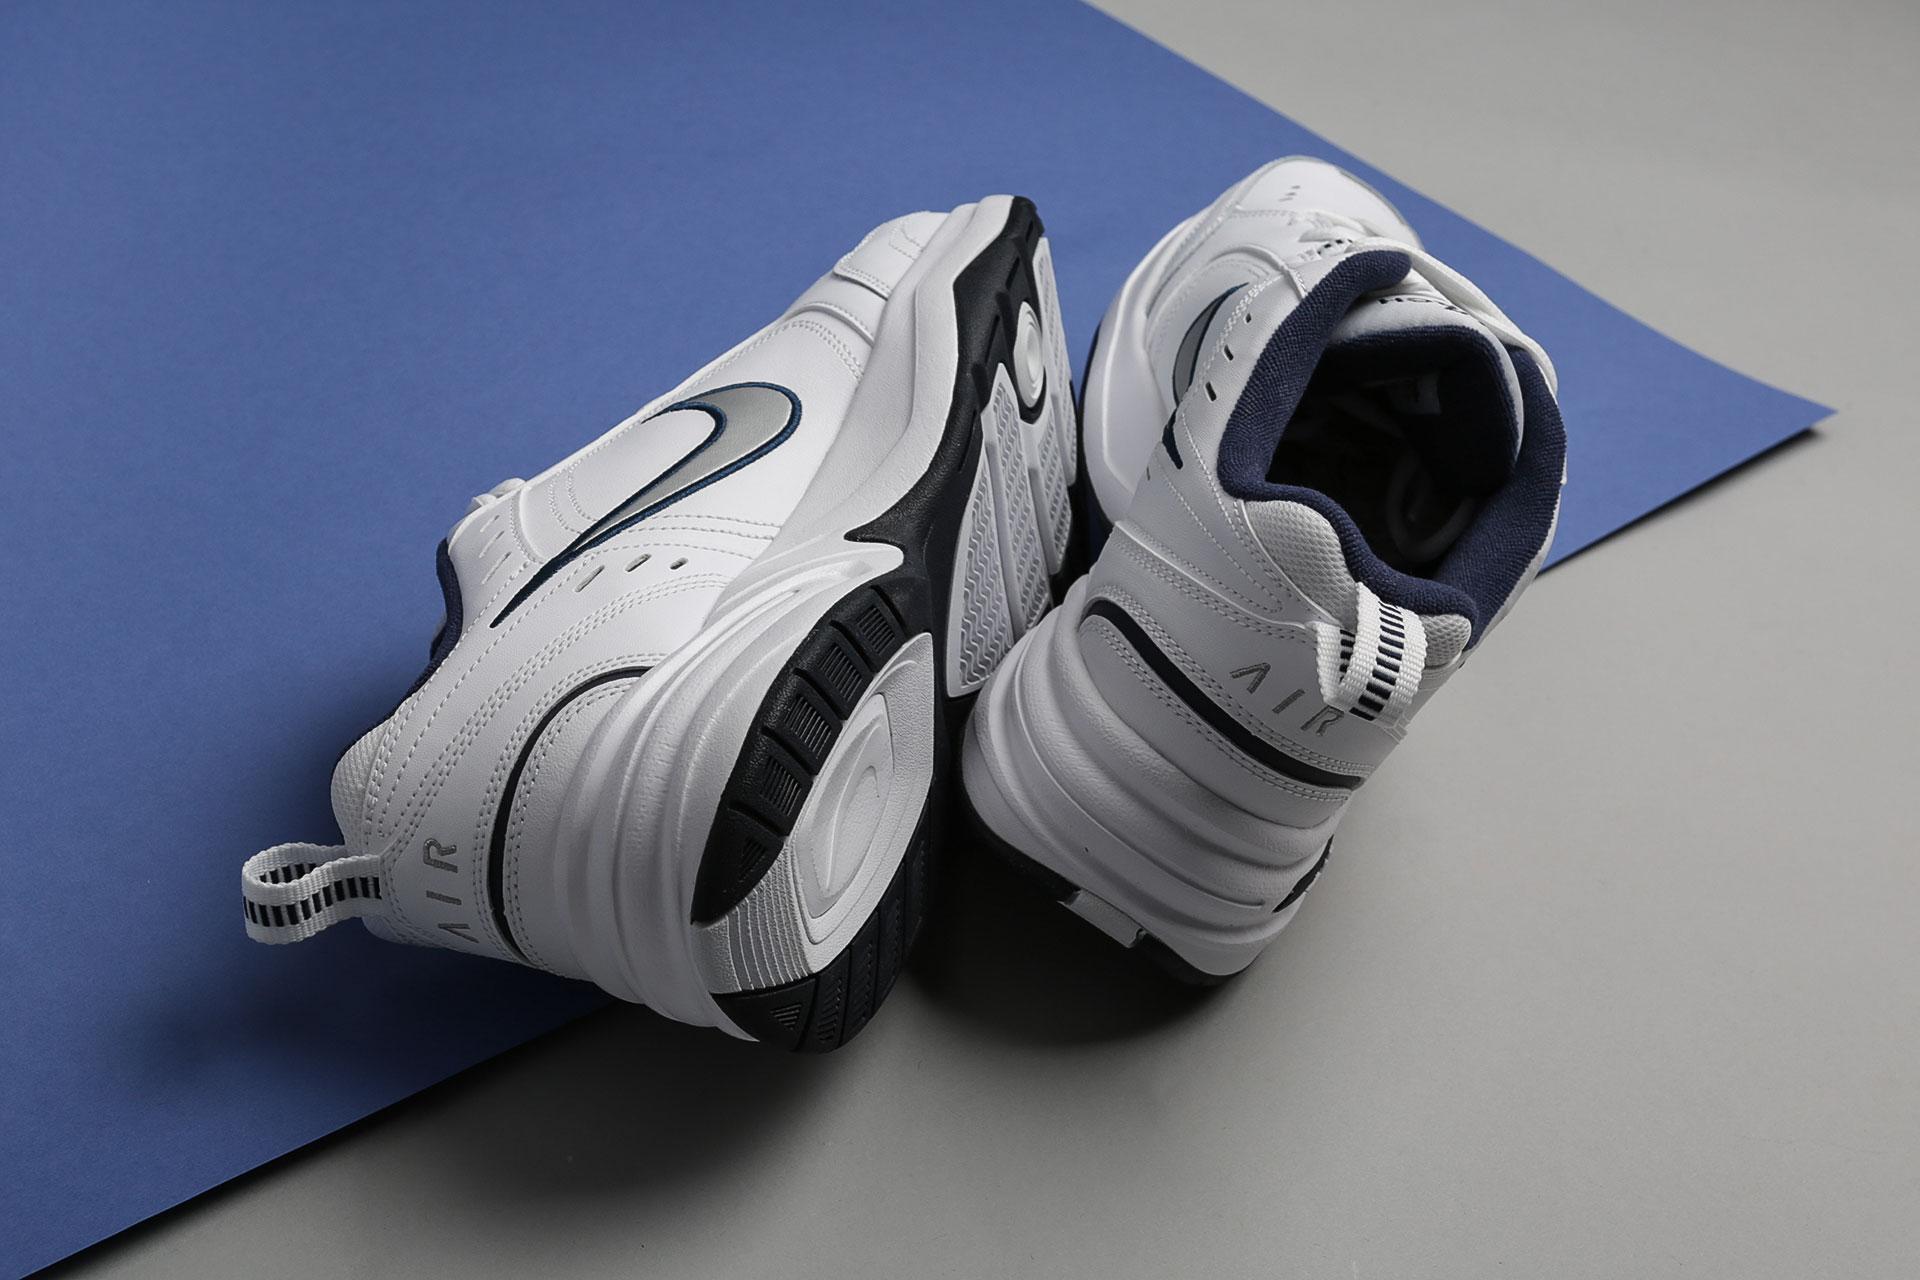 90ea0671 ... Купить мужские белые кроссовки Nike Air Monarch IV - фото 4 картинки ...